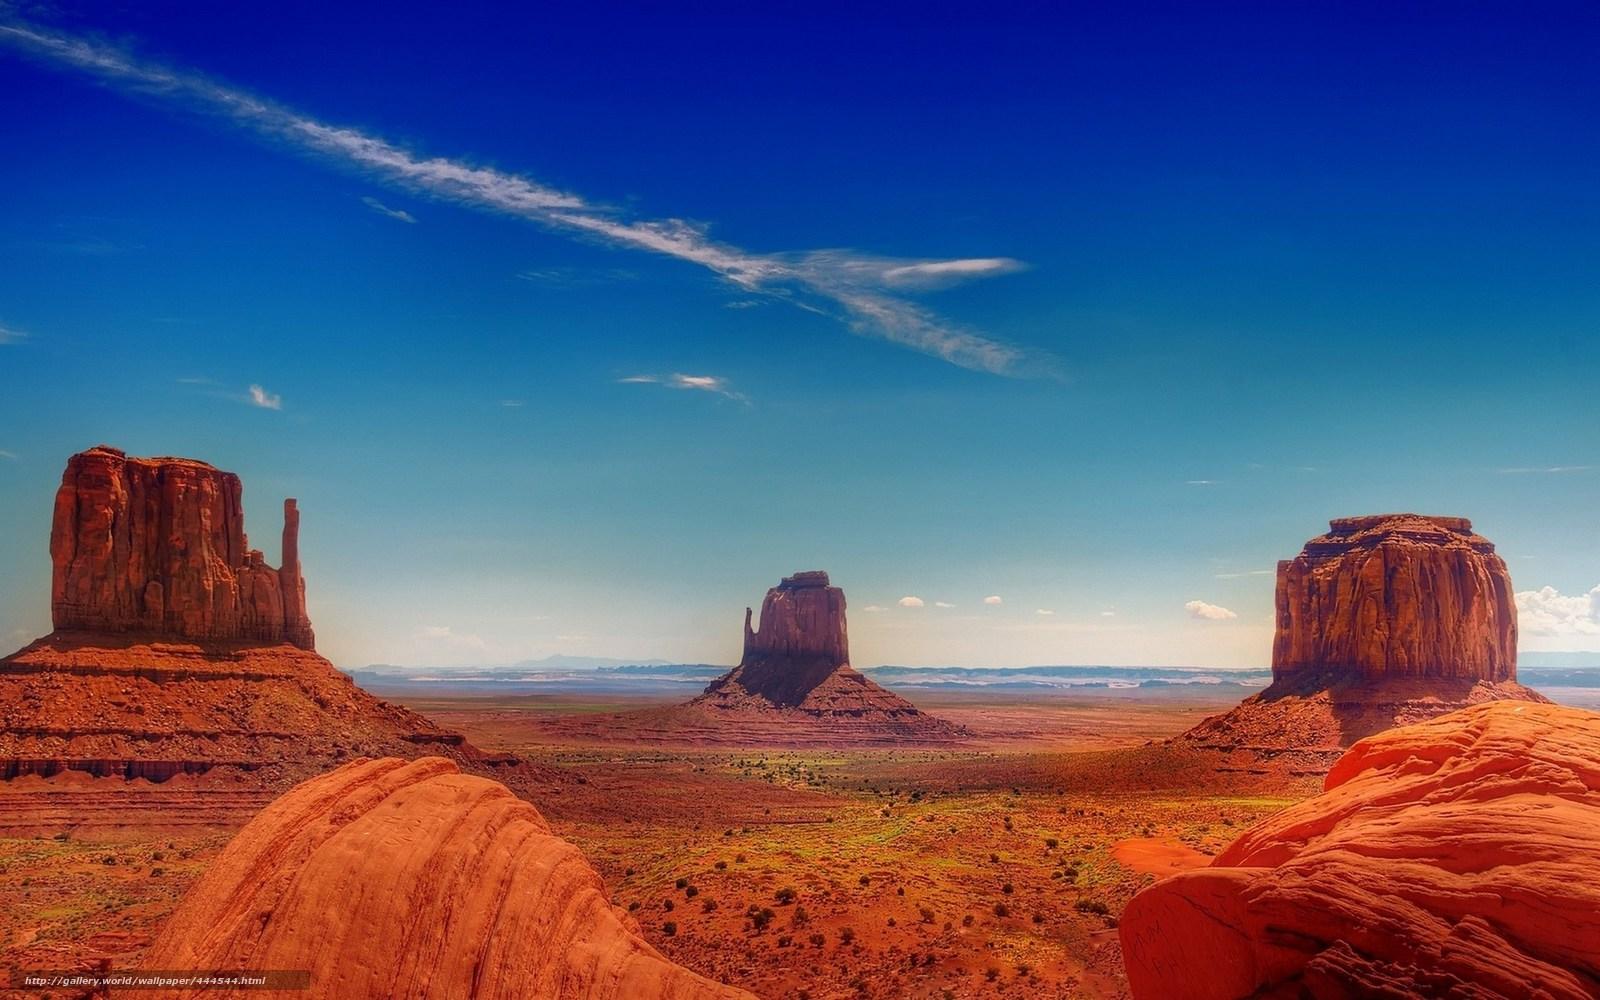 Download wallpaper canyon USA USA Arizona desktop wallpaper in 1600x1000